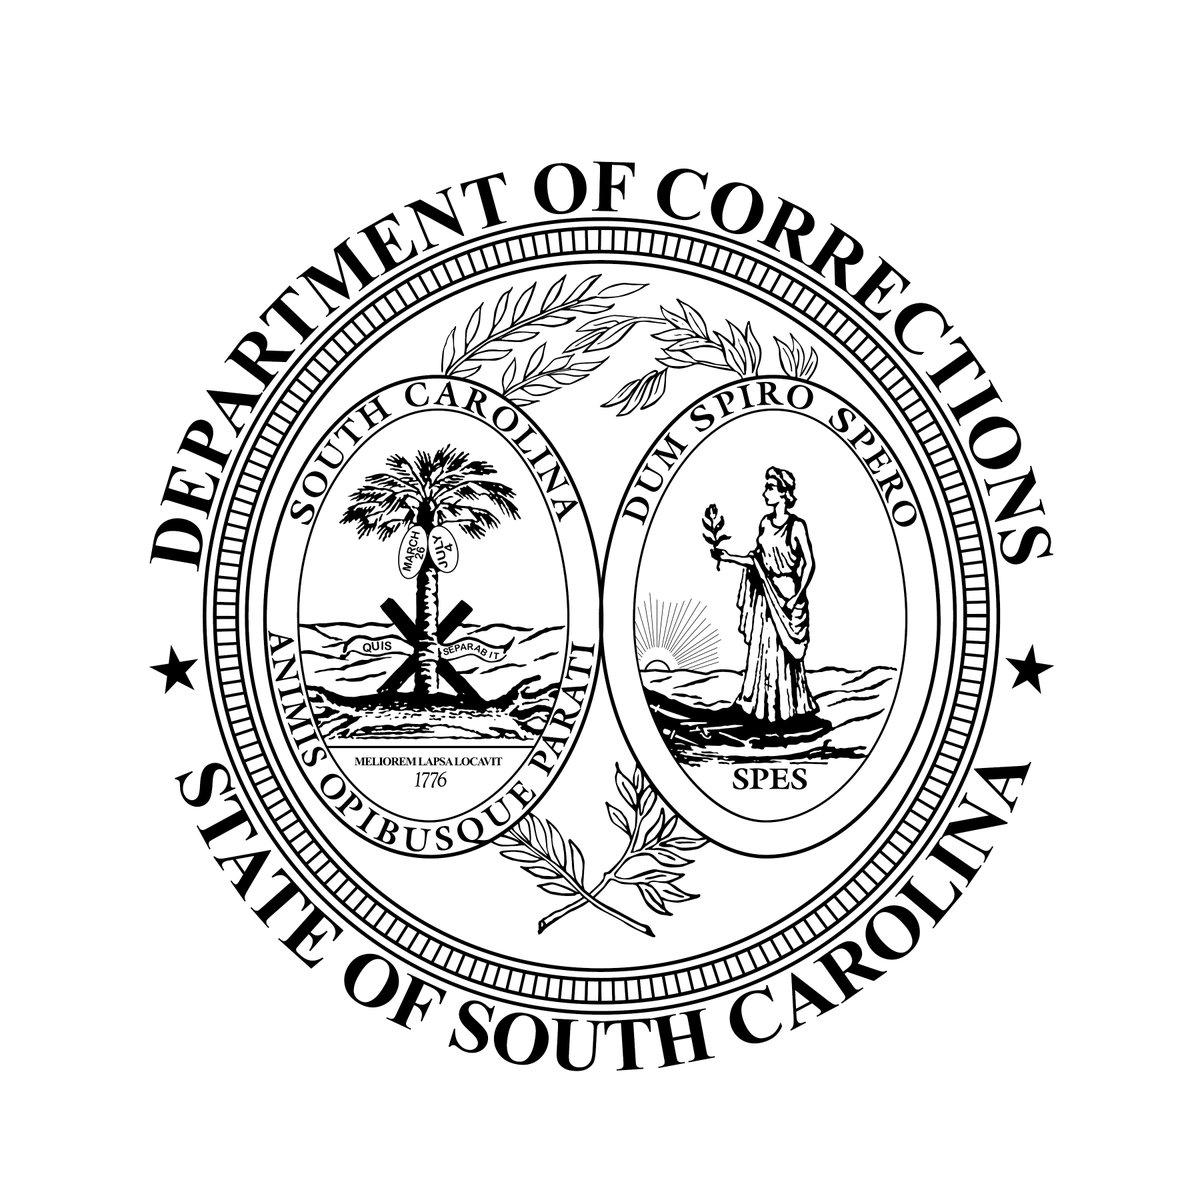 badge for South Carolina corresctions dept